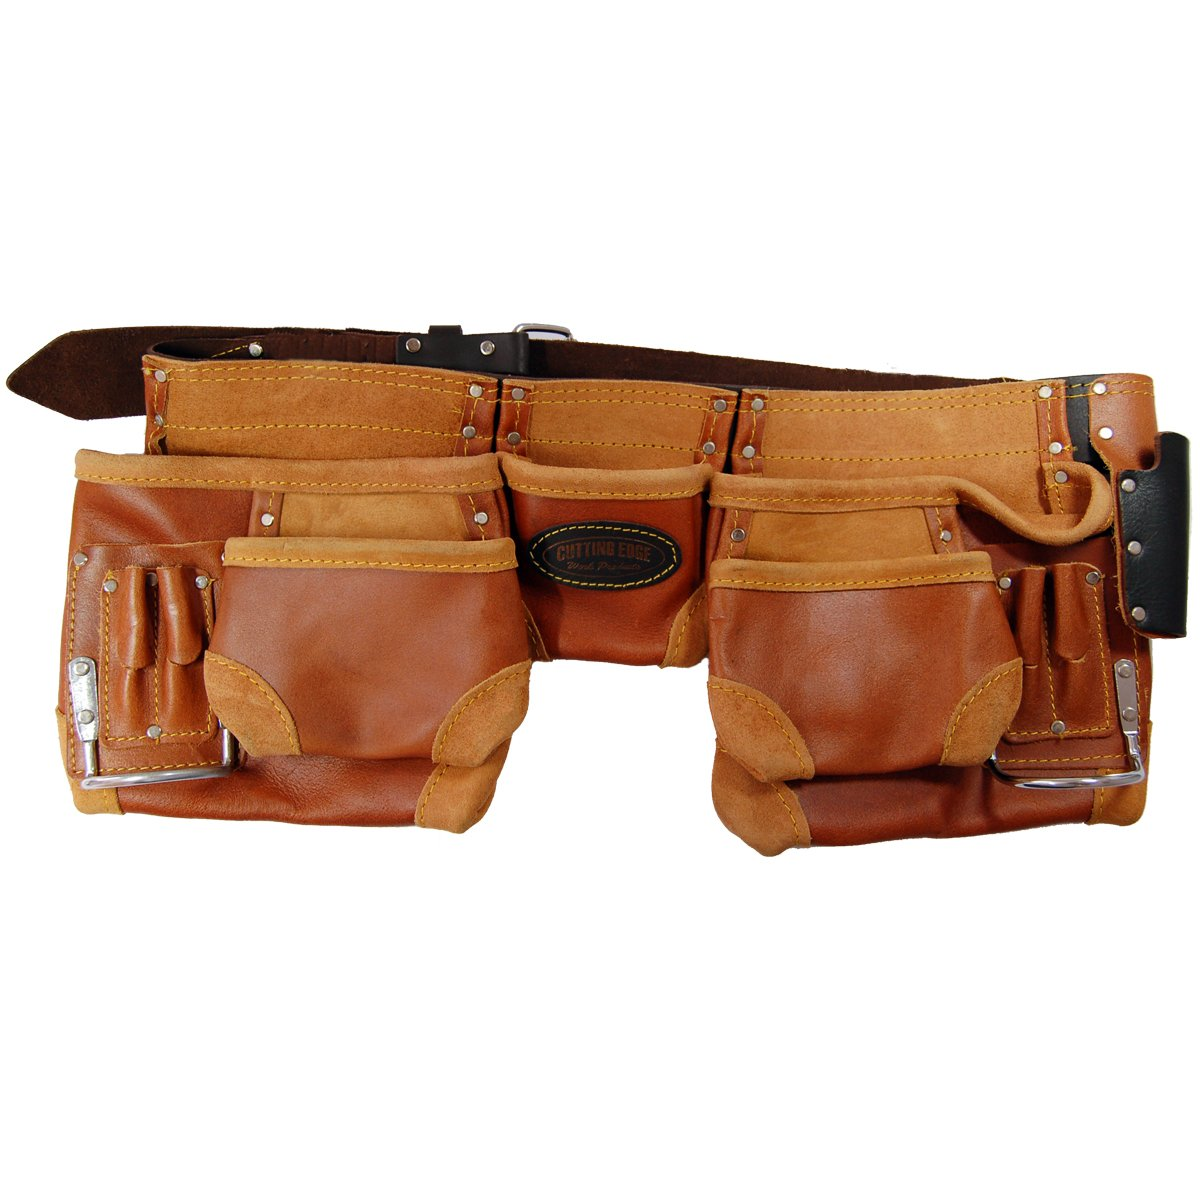 Astra Carpenters Tool Apron CEOTSP11P Split Oil Tan Leather